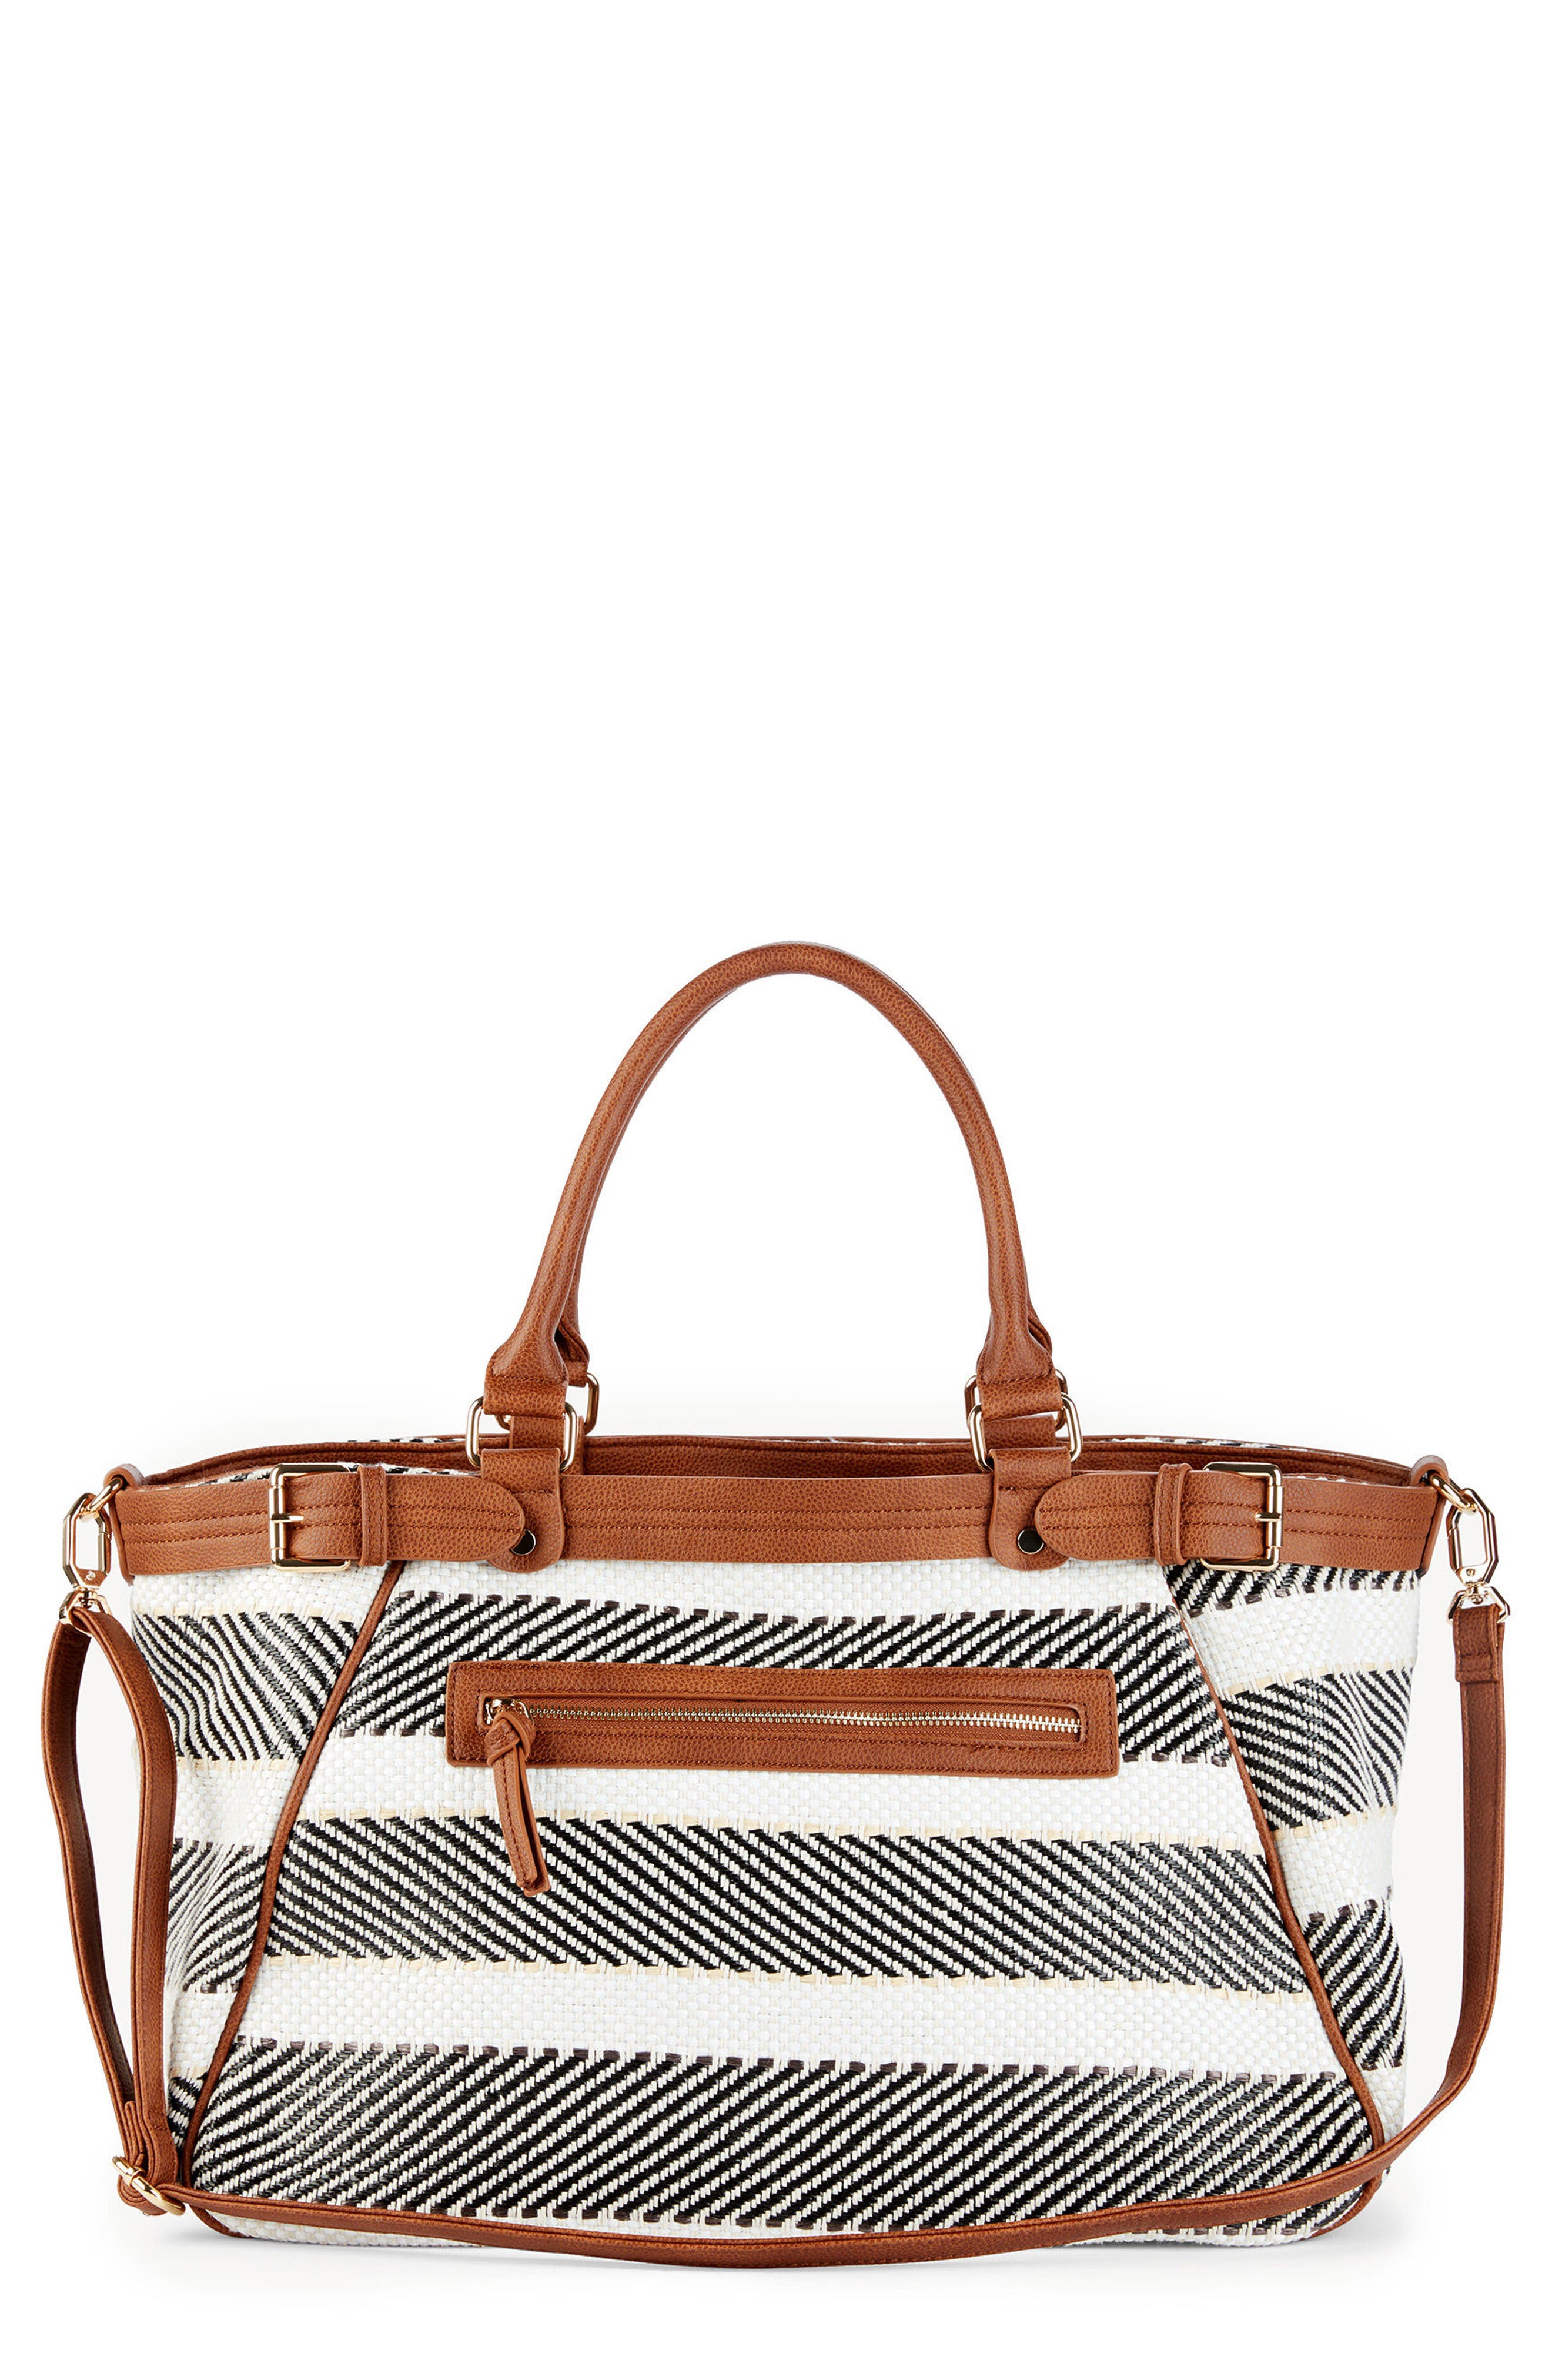 Stripe Woven Weekend Bag,                         Main,                         color, Black/ Cream Combo